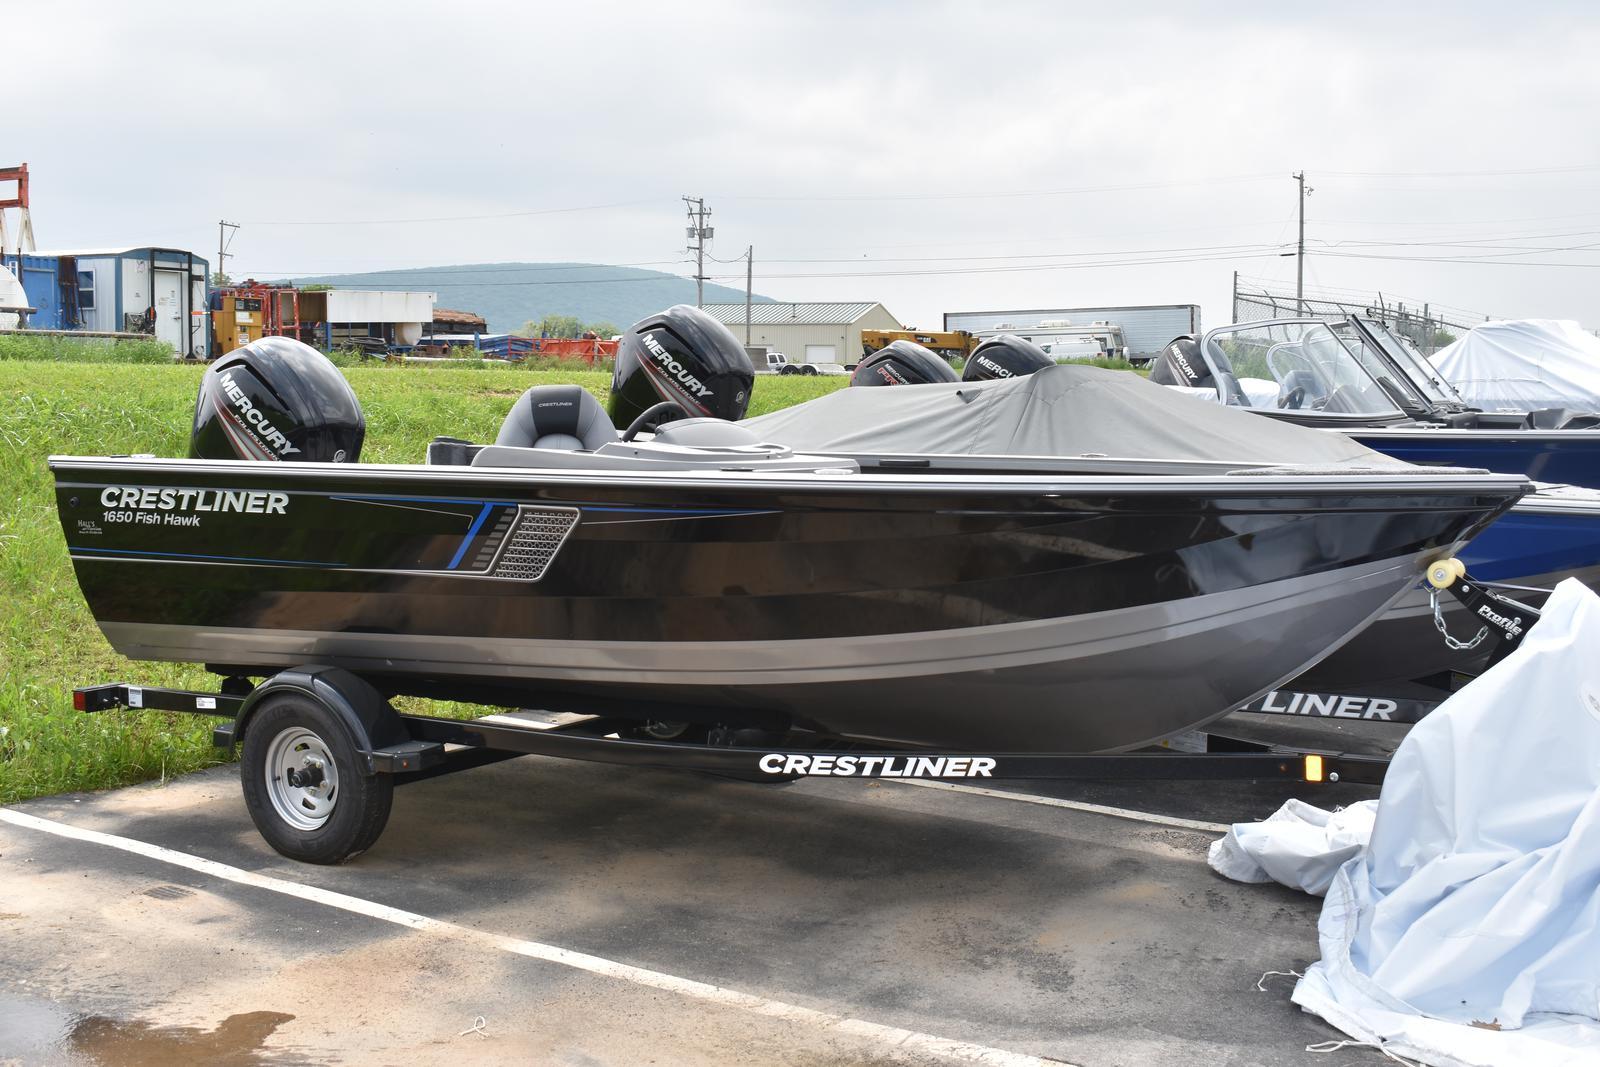 2018 Crestliner 1650 Fish Hawk Sc For Sale In Muncy Pa Halls Boat Trailer 4 Pole Connector On Wiring Marine 570 935 0159